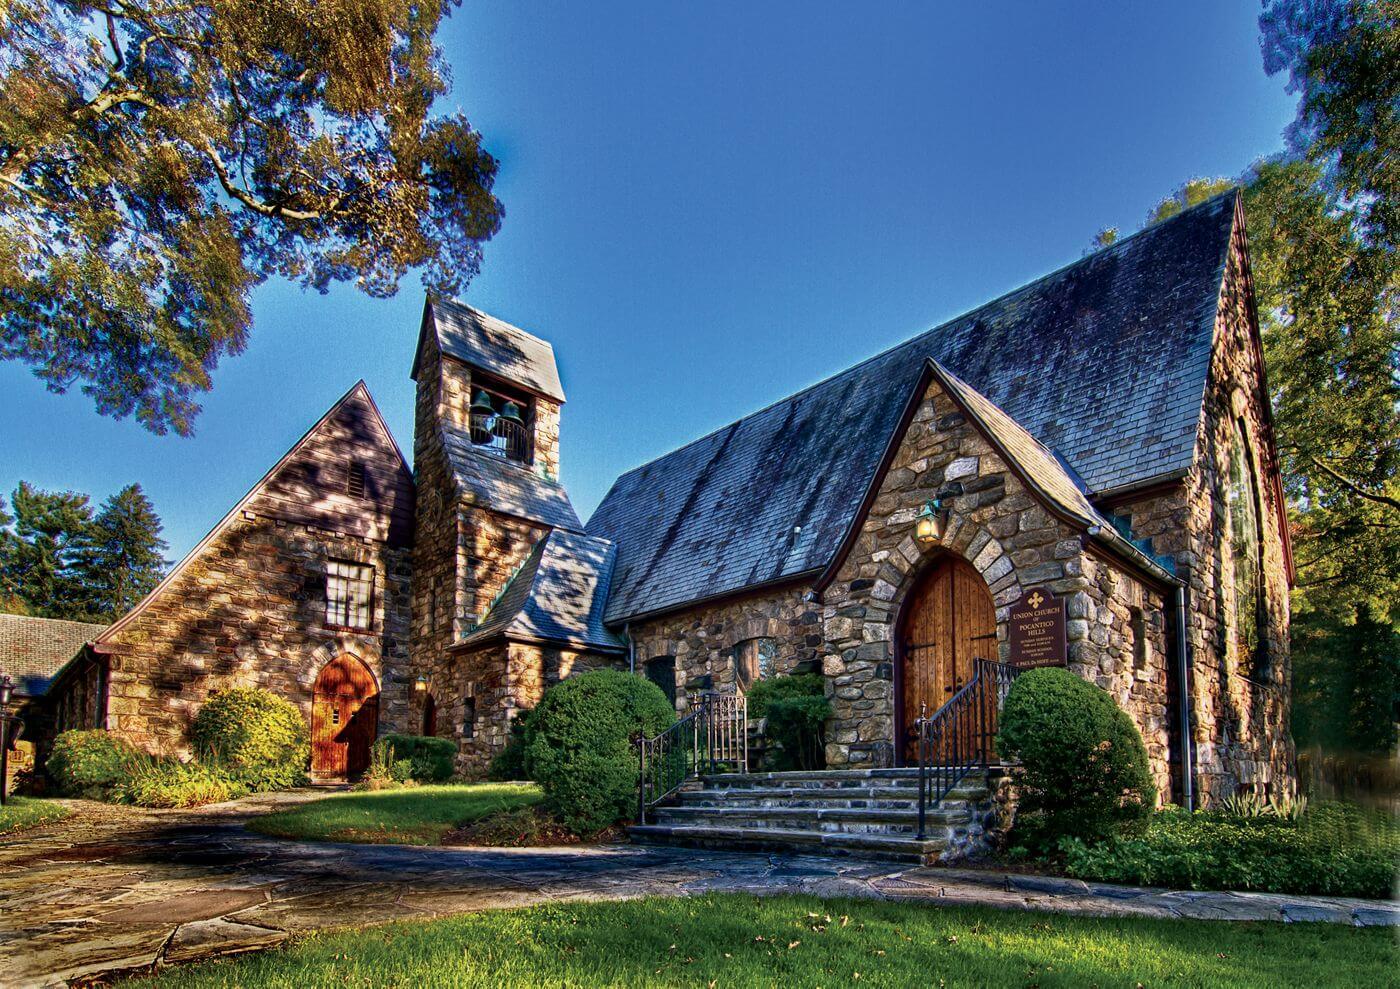 Union Church v2.jpeg